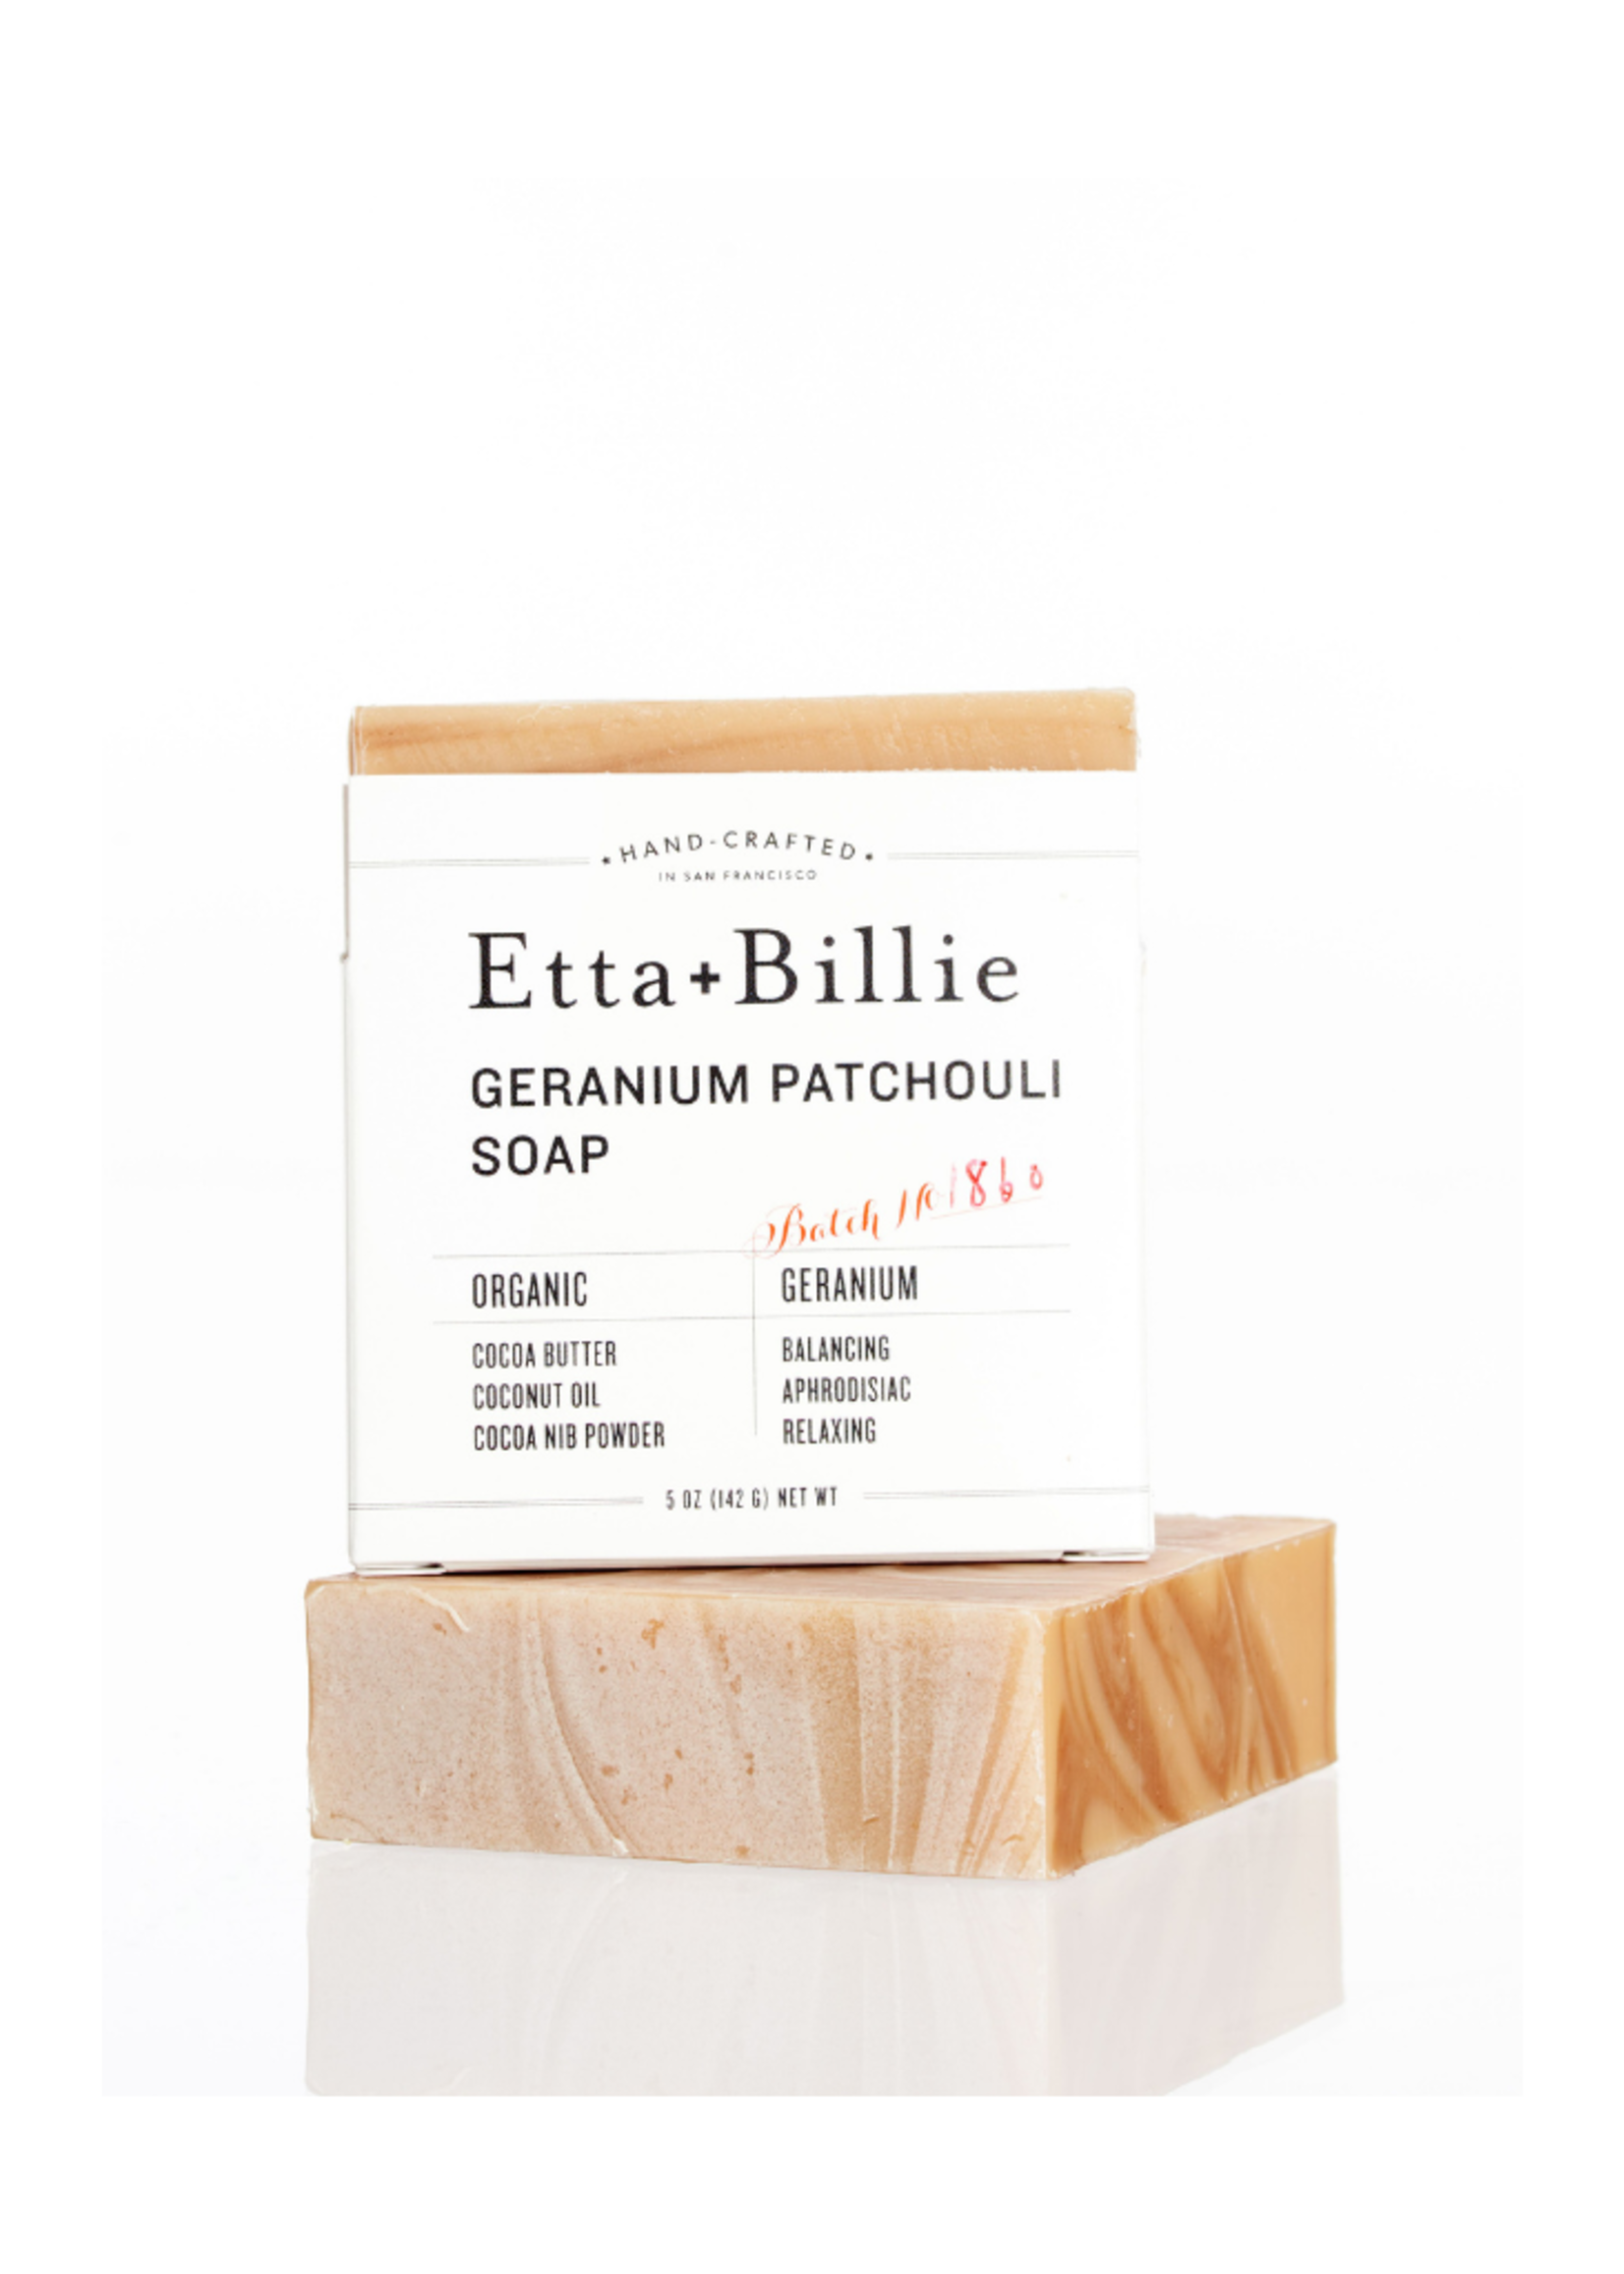 Etta+Billie Etta + Billie Geranium Patchouli Soap